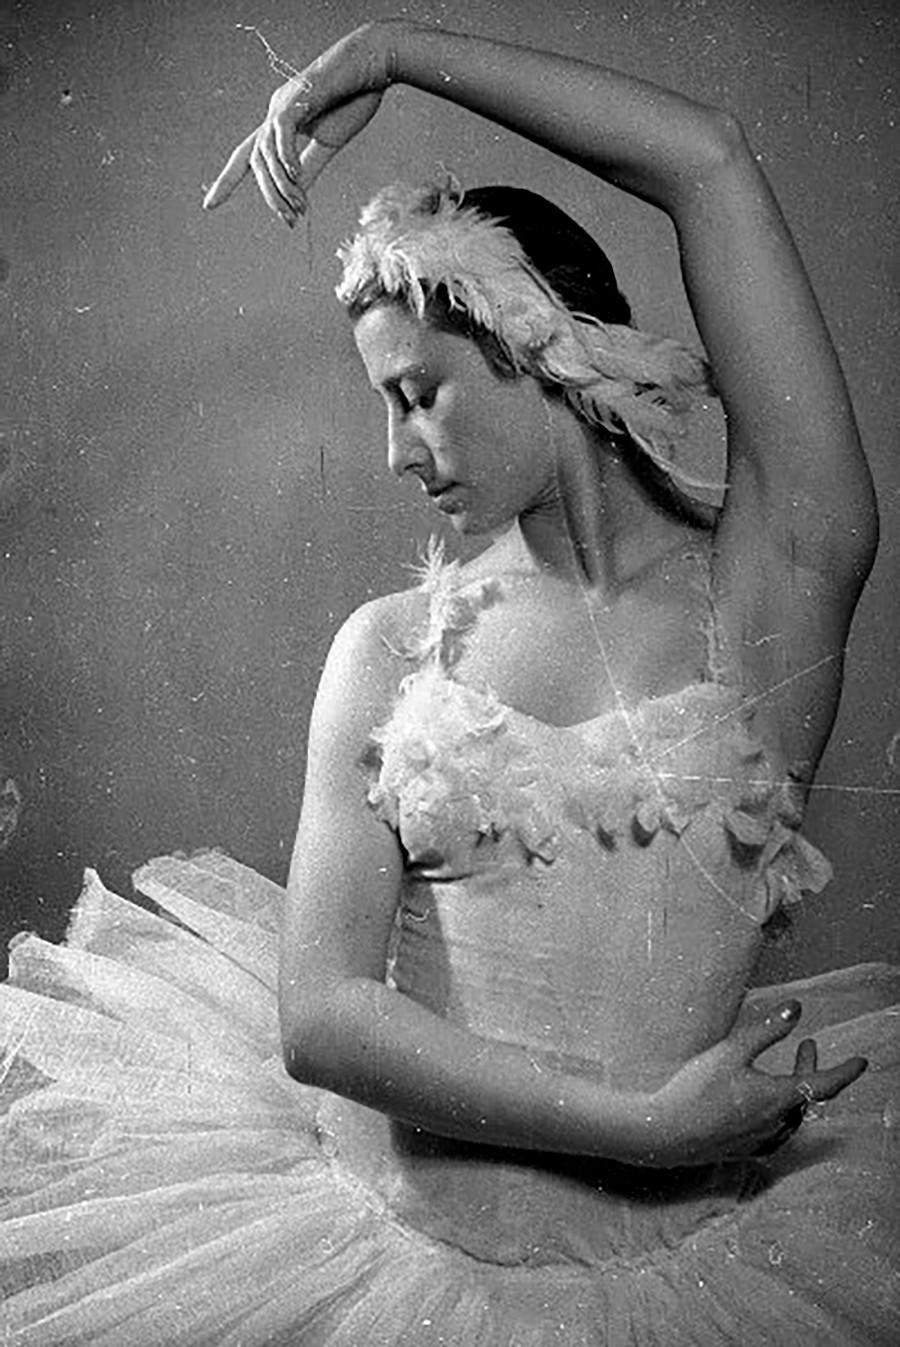 La ballerine légendaire Maïa Plissetskaïa